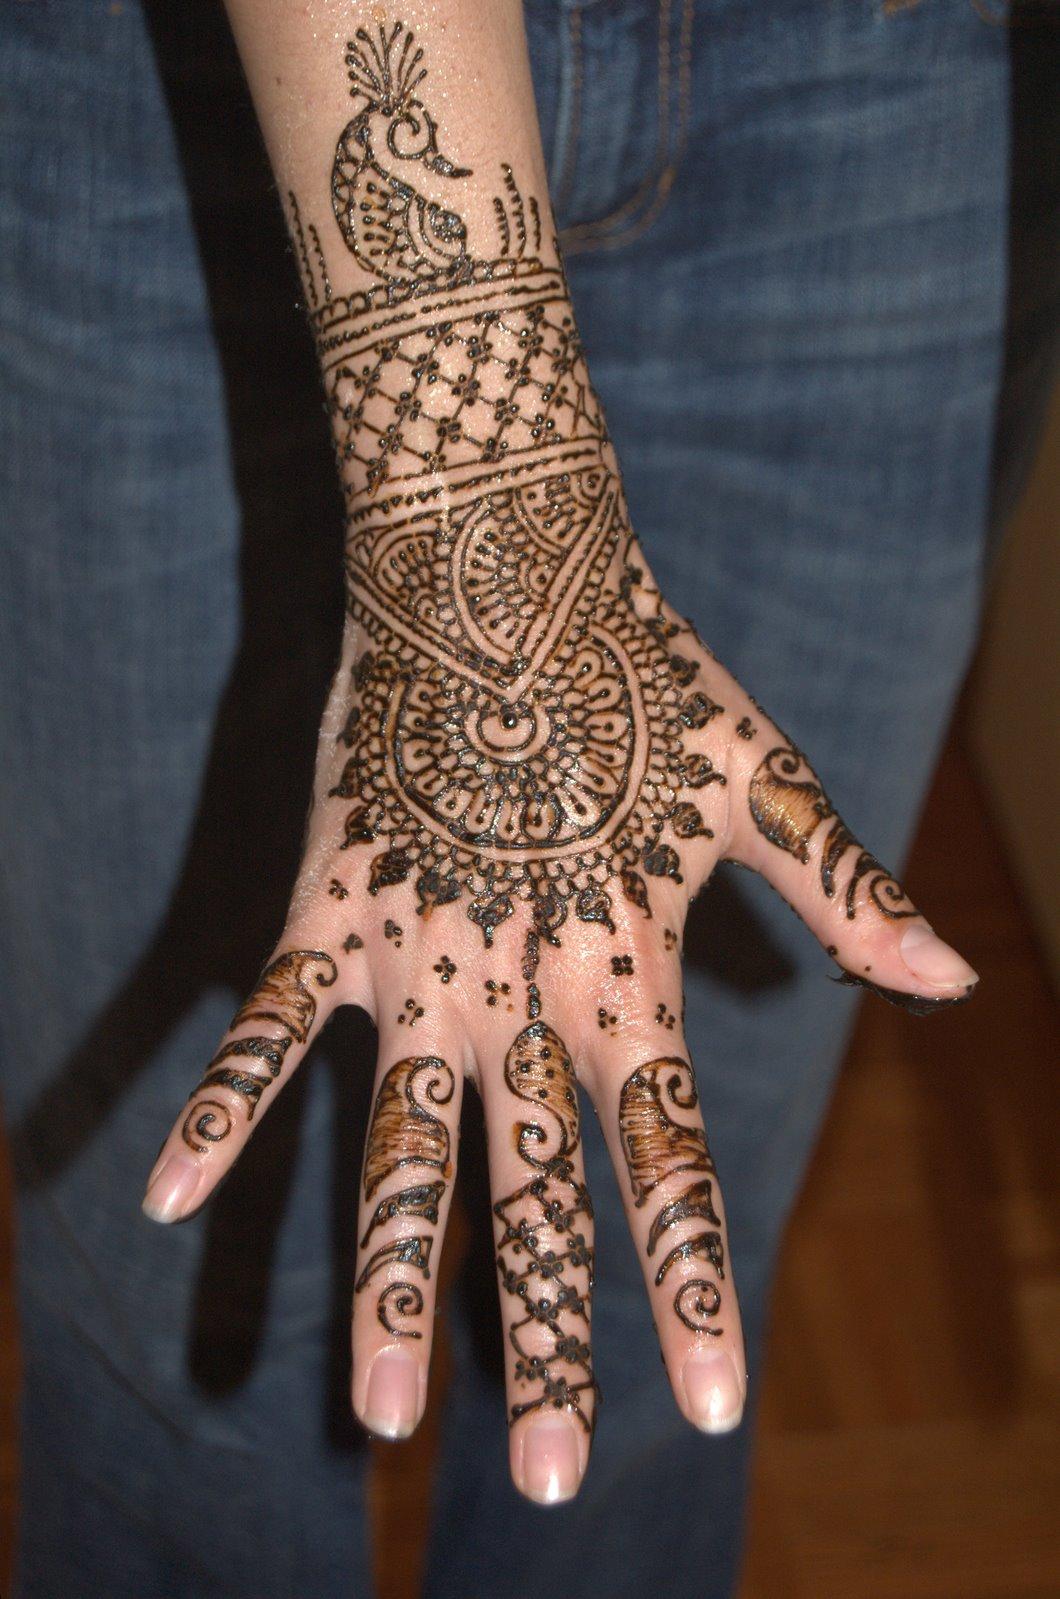 Elegant-Back-Hand-Henna-Mehndi-Design.jp